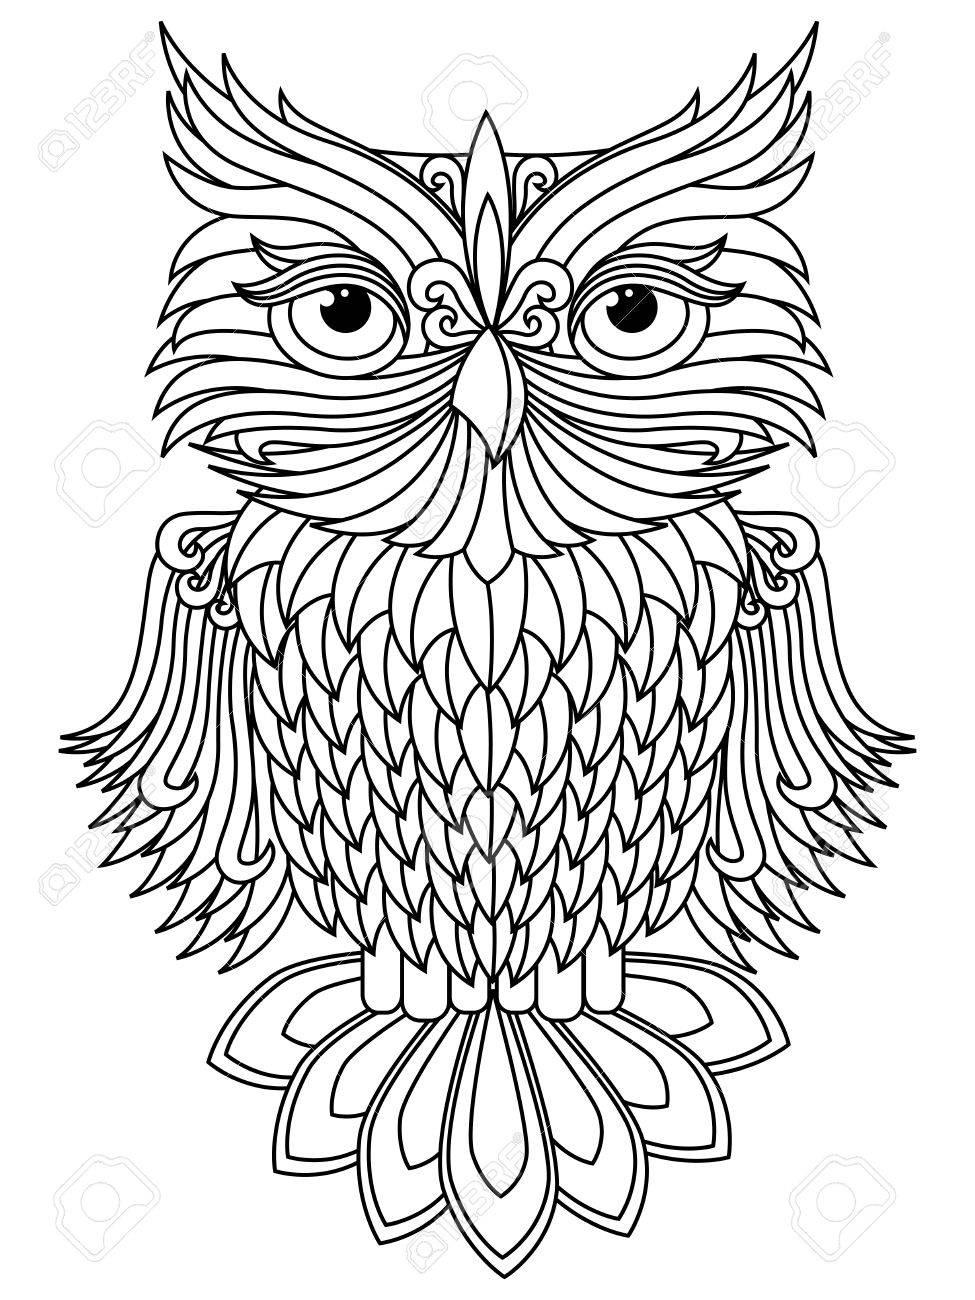 Amusing Big Owl Black Outline Isolated On The White Background